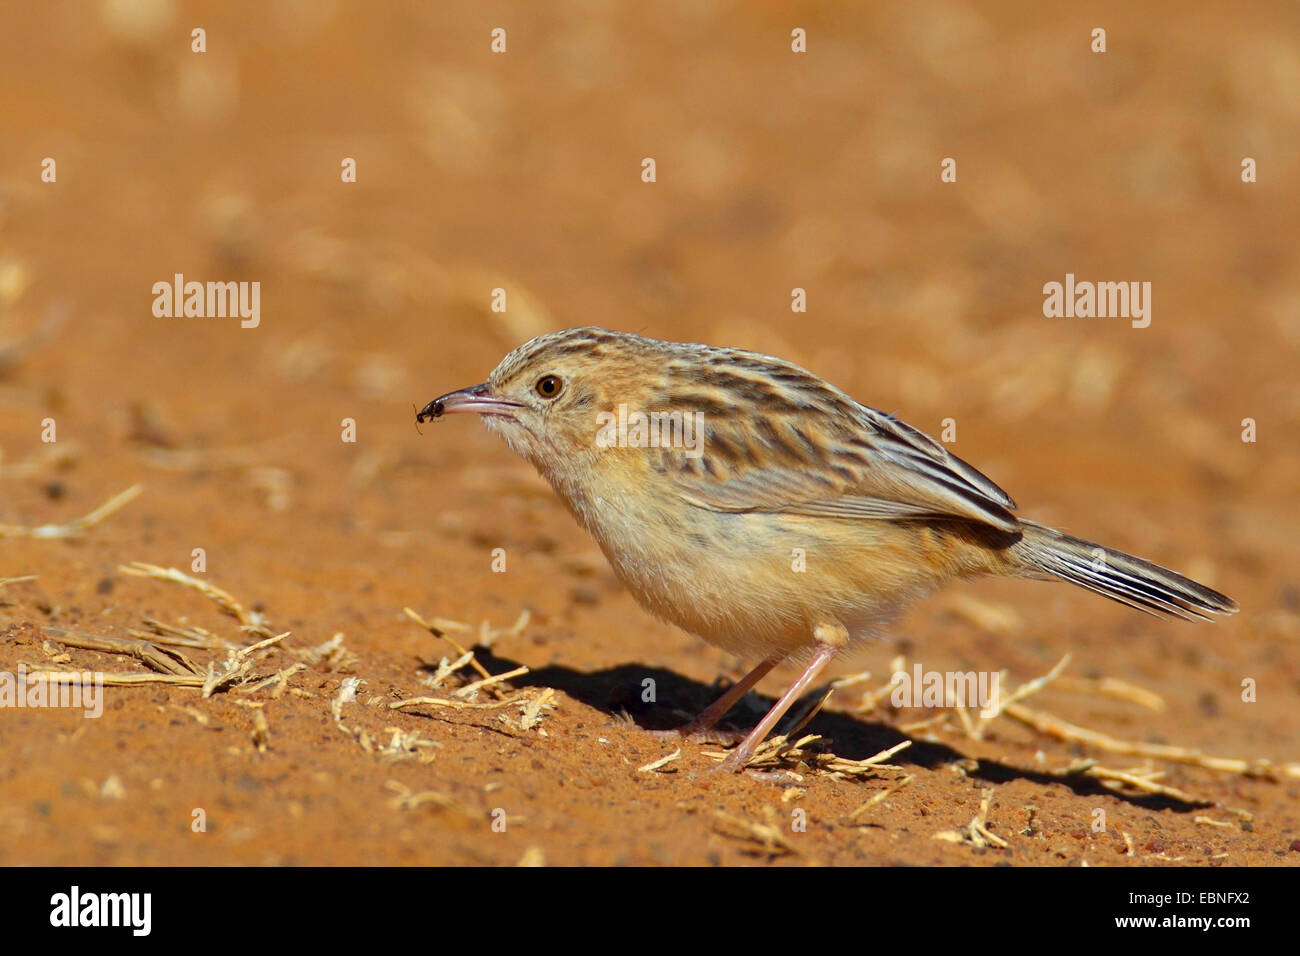 Desert cisticola (Cisticola aridula), eating ants on the ground, South Africa, Barberspan Bird Sanctury - Stock Image